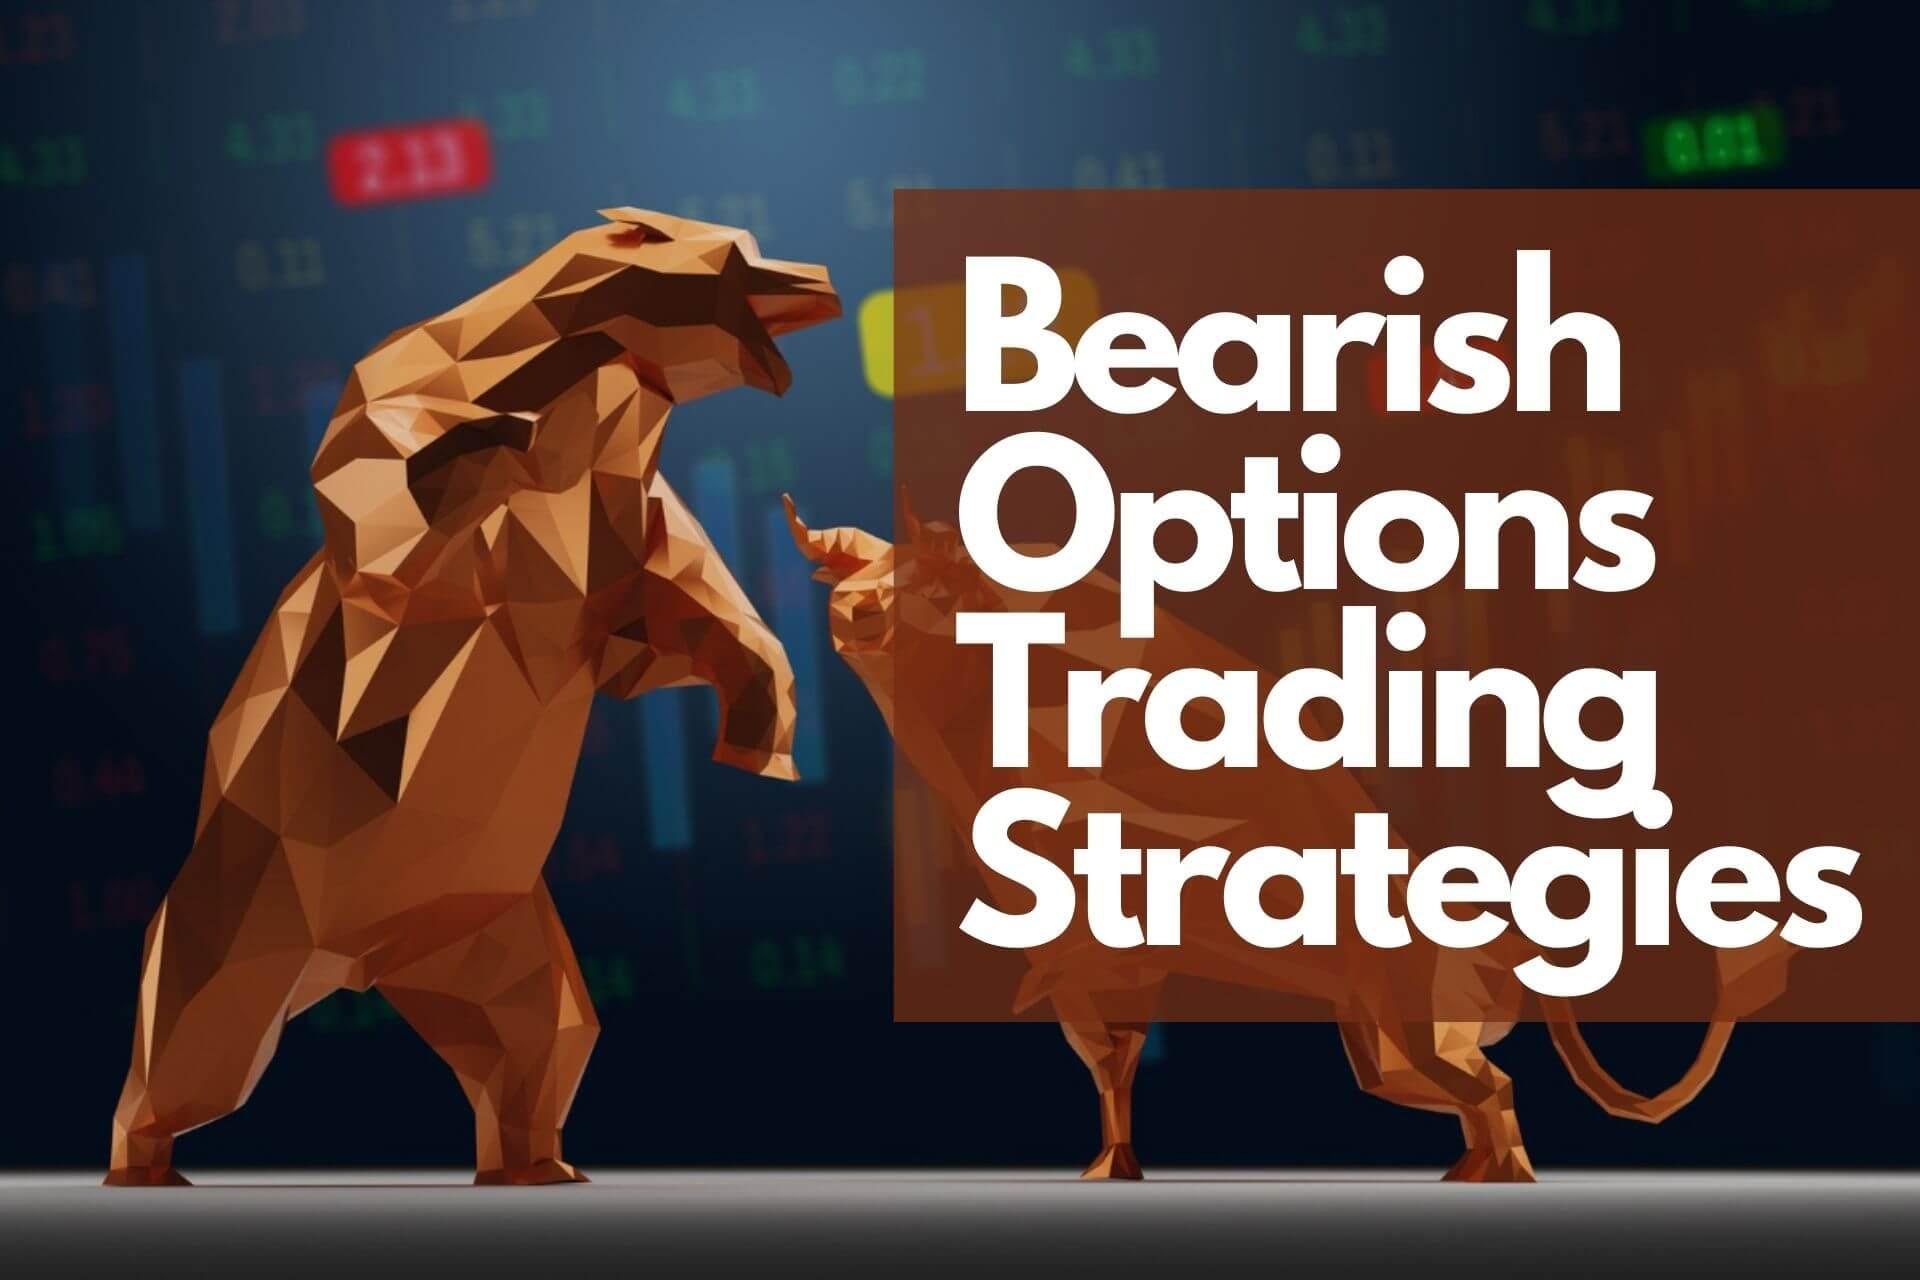 Bearish Options Trading Strategies – How to Use Options in Bearish Market?